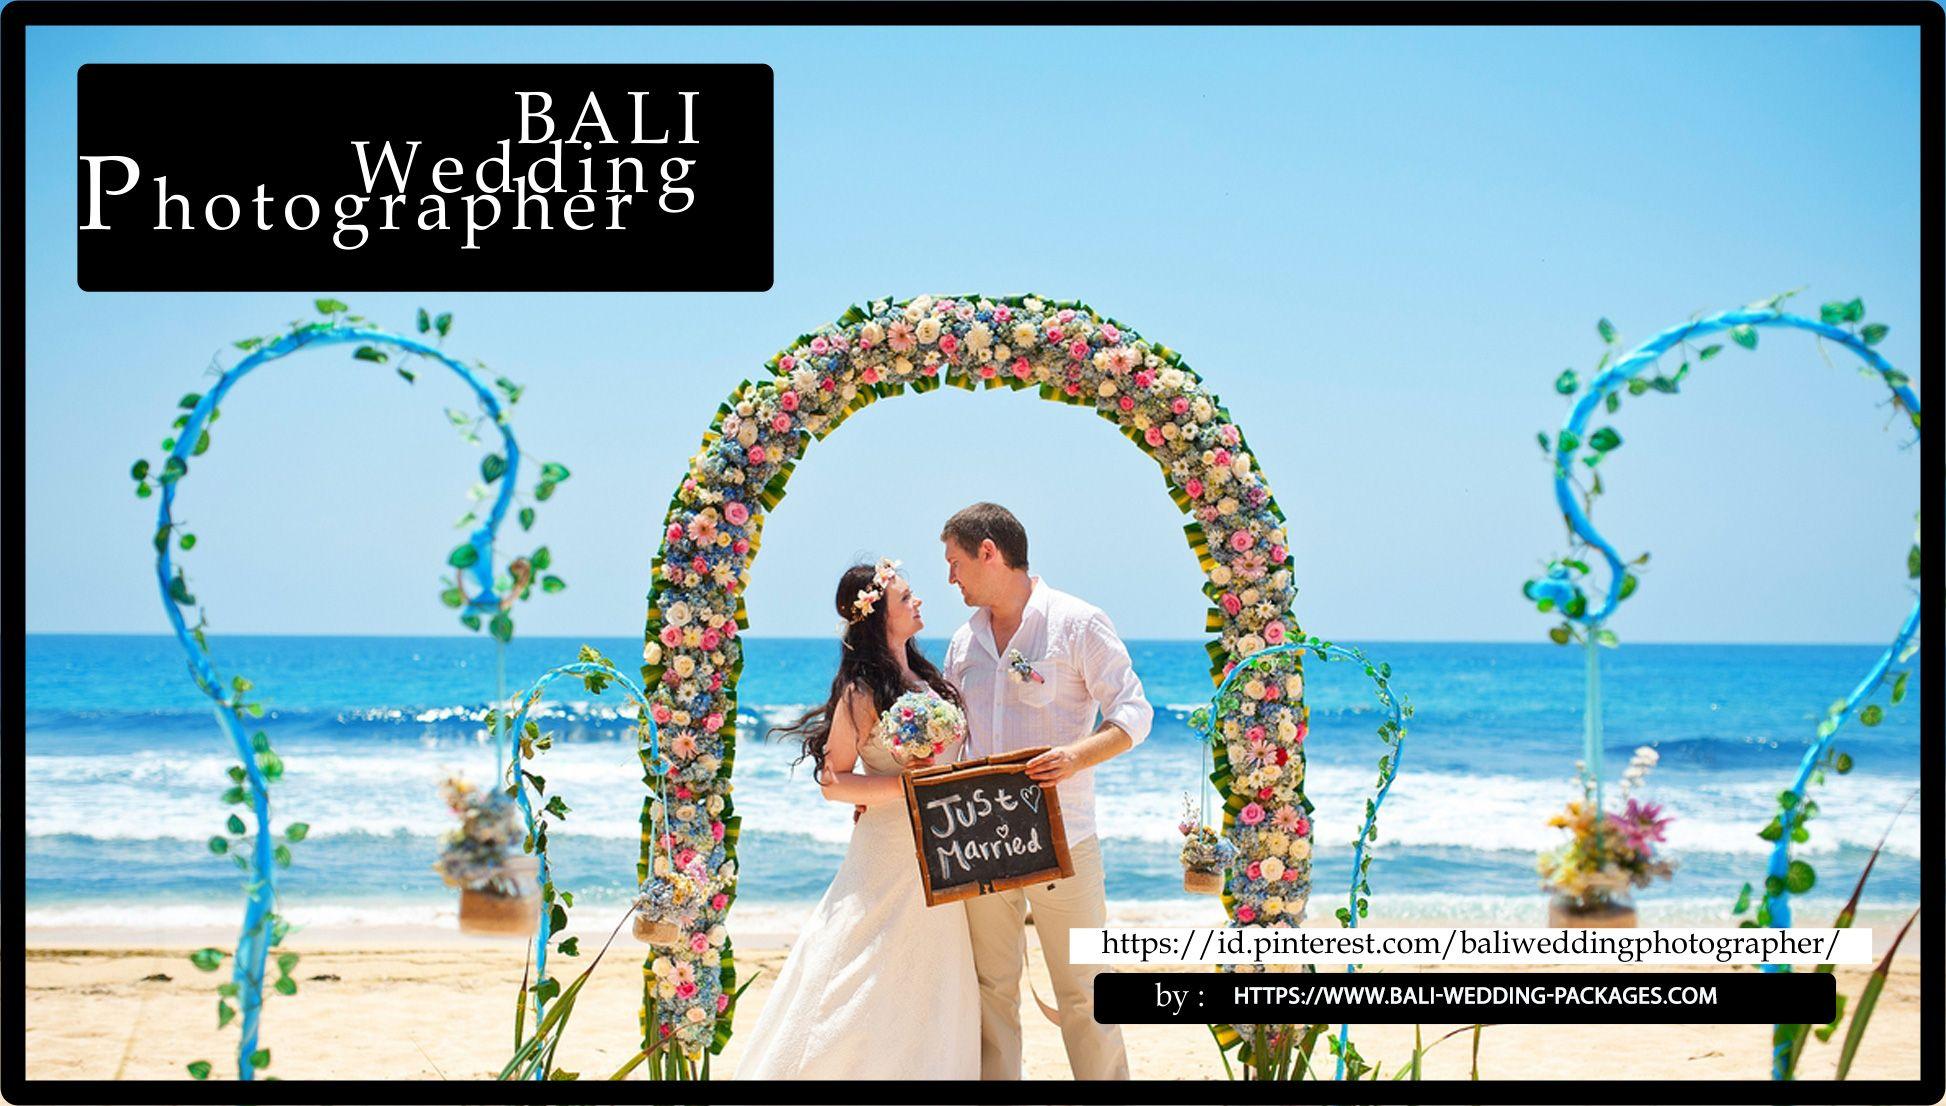 Pin oleh Baliweddingphotographer Packag di Bali Beach